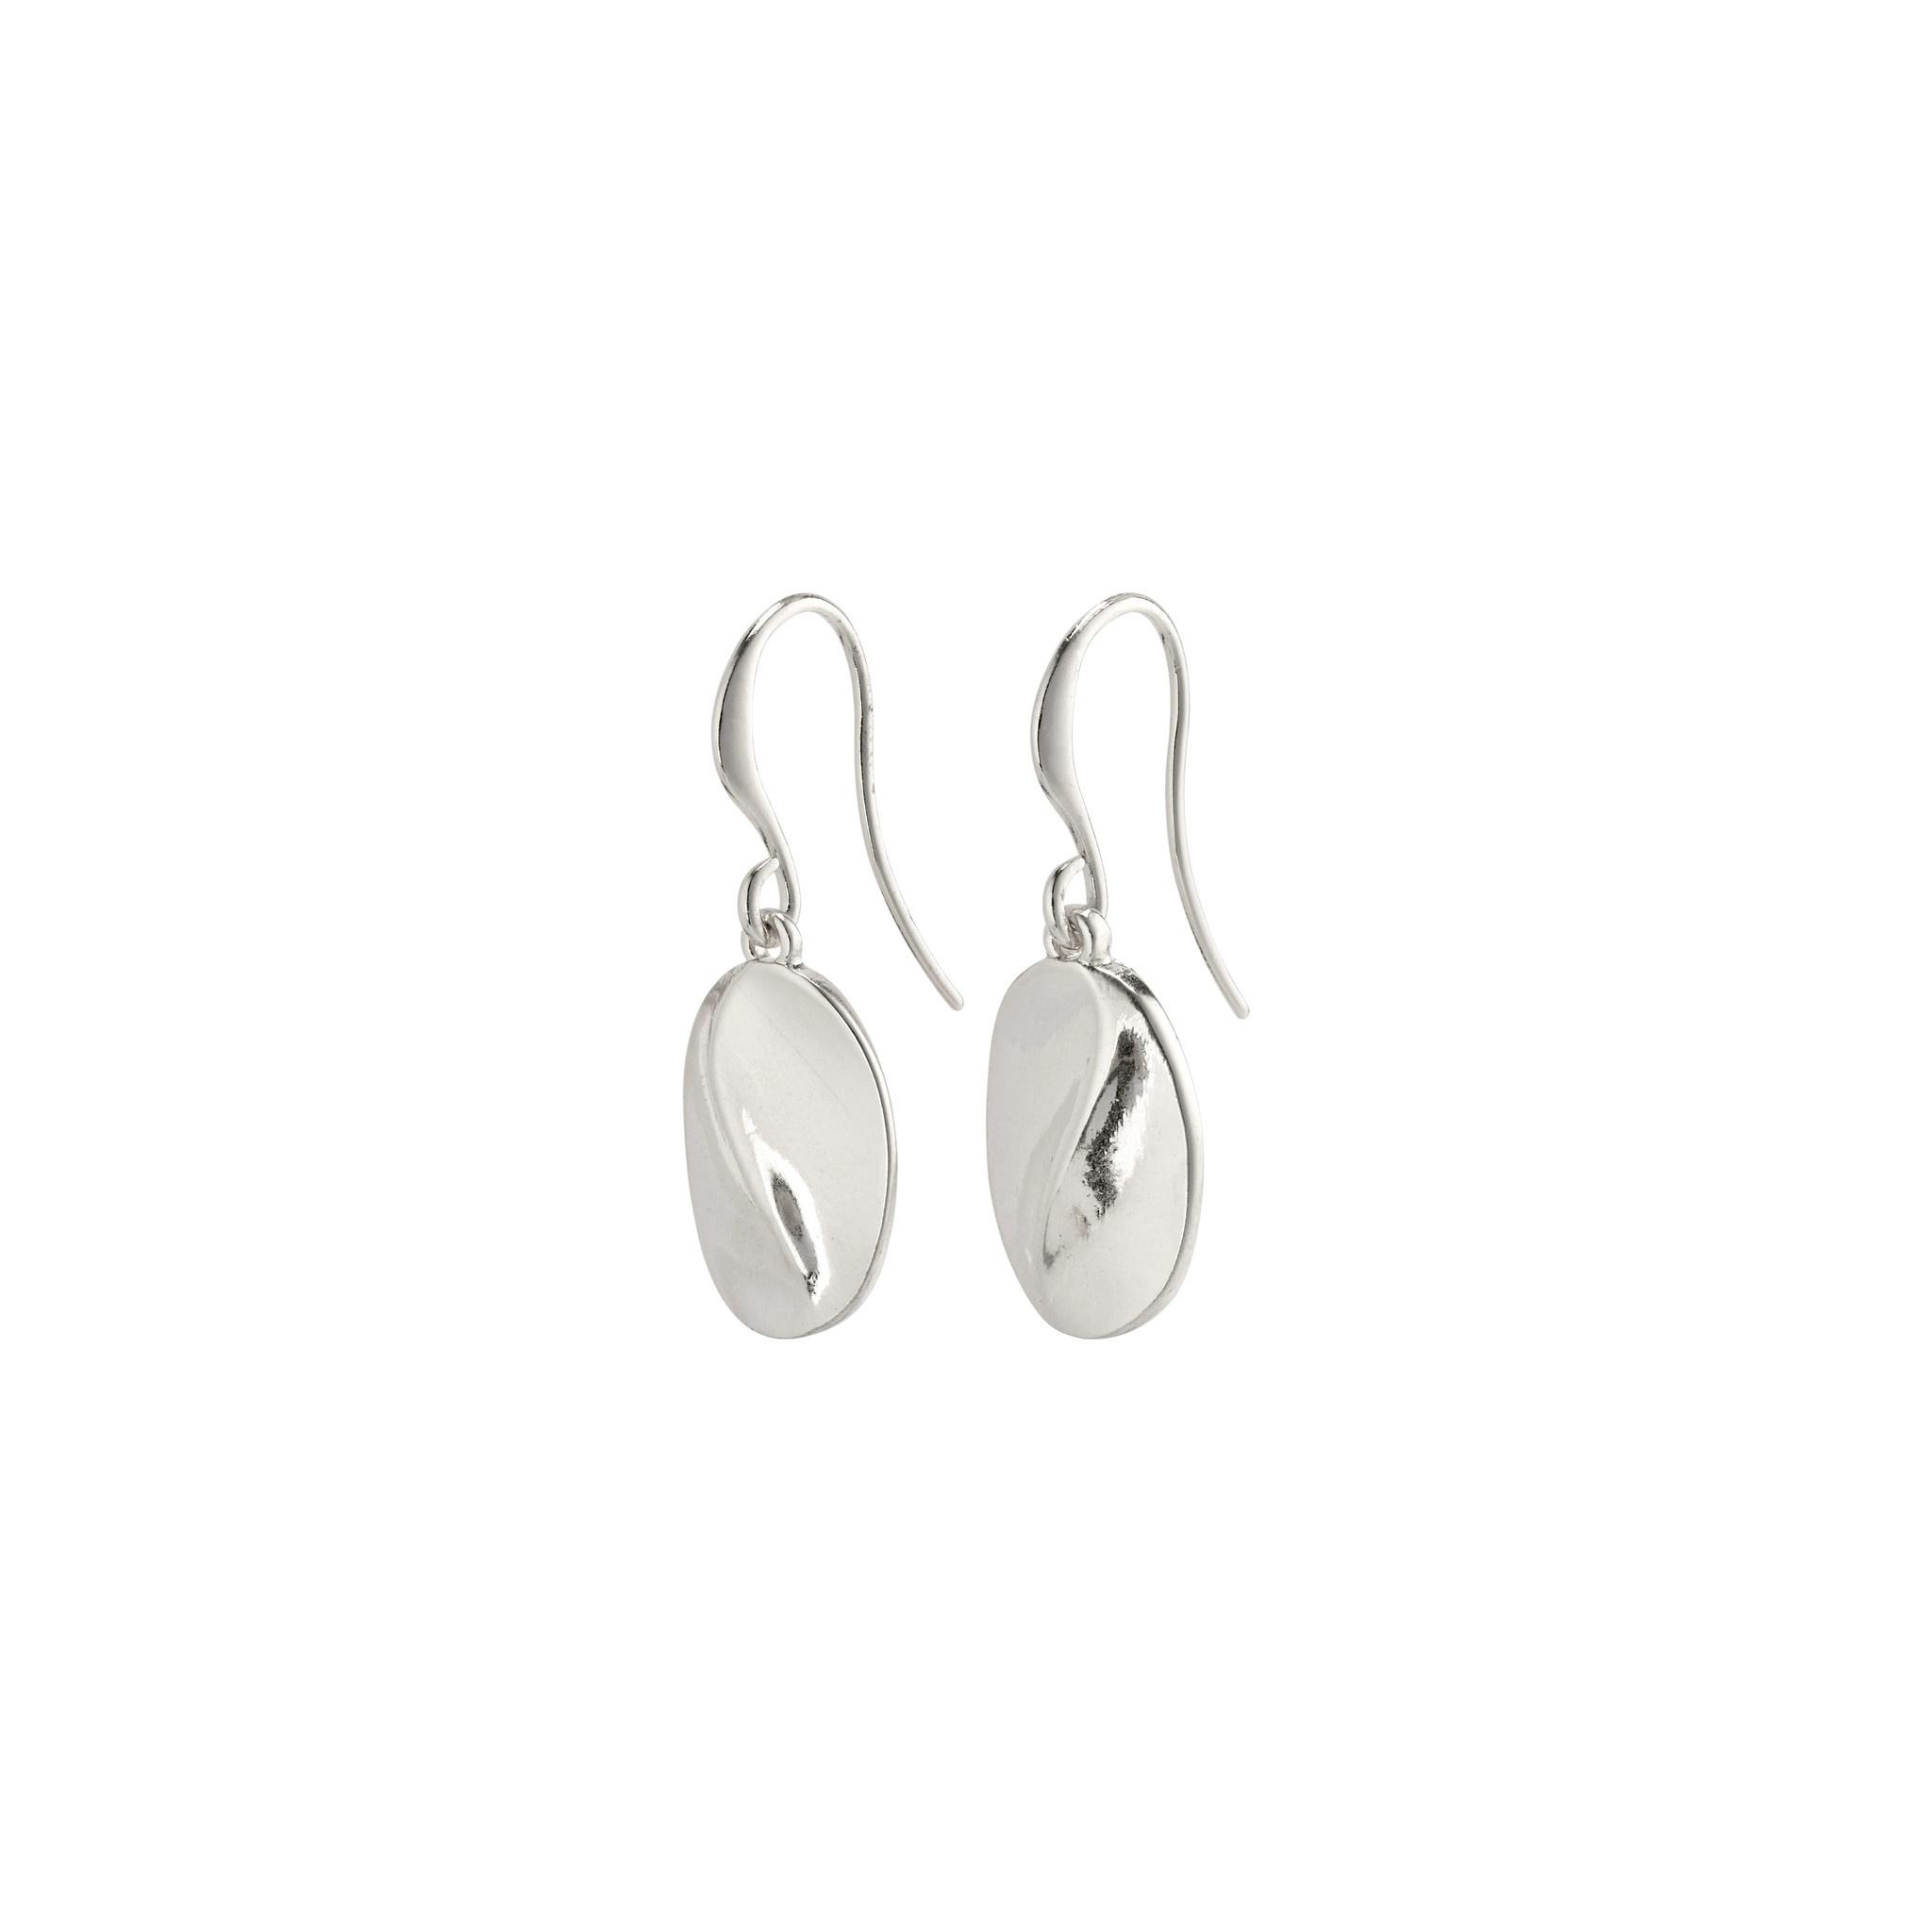 Pilgrim Earring Mabelle Silver Plated - 622036003